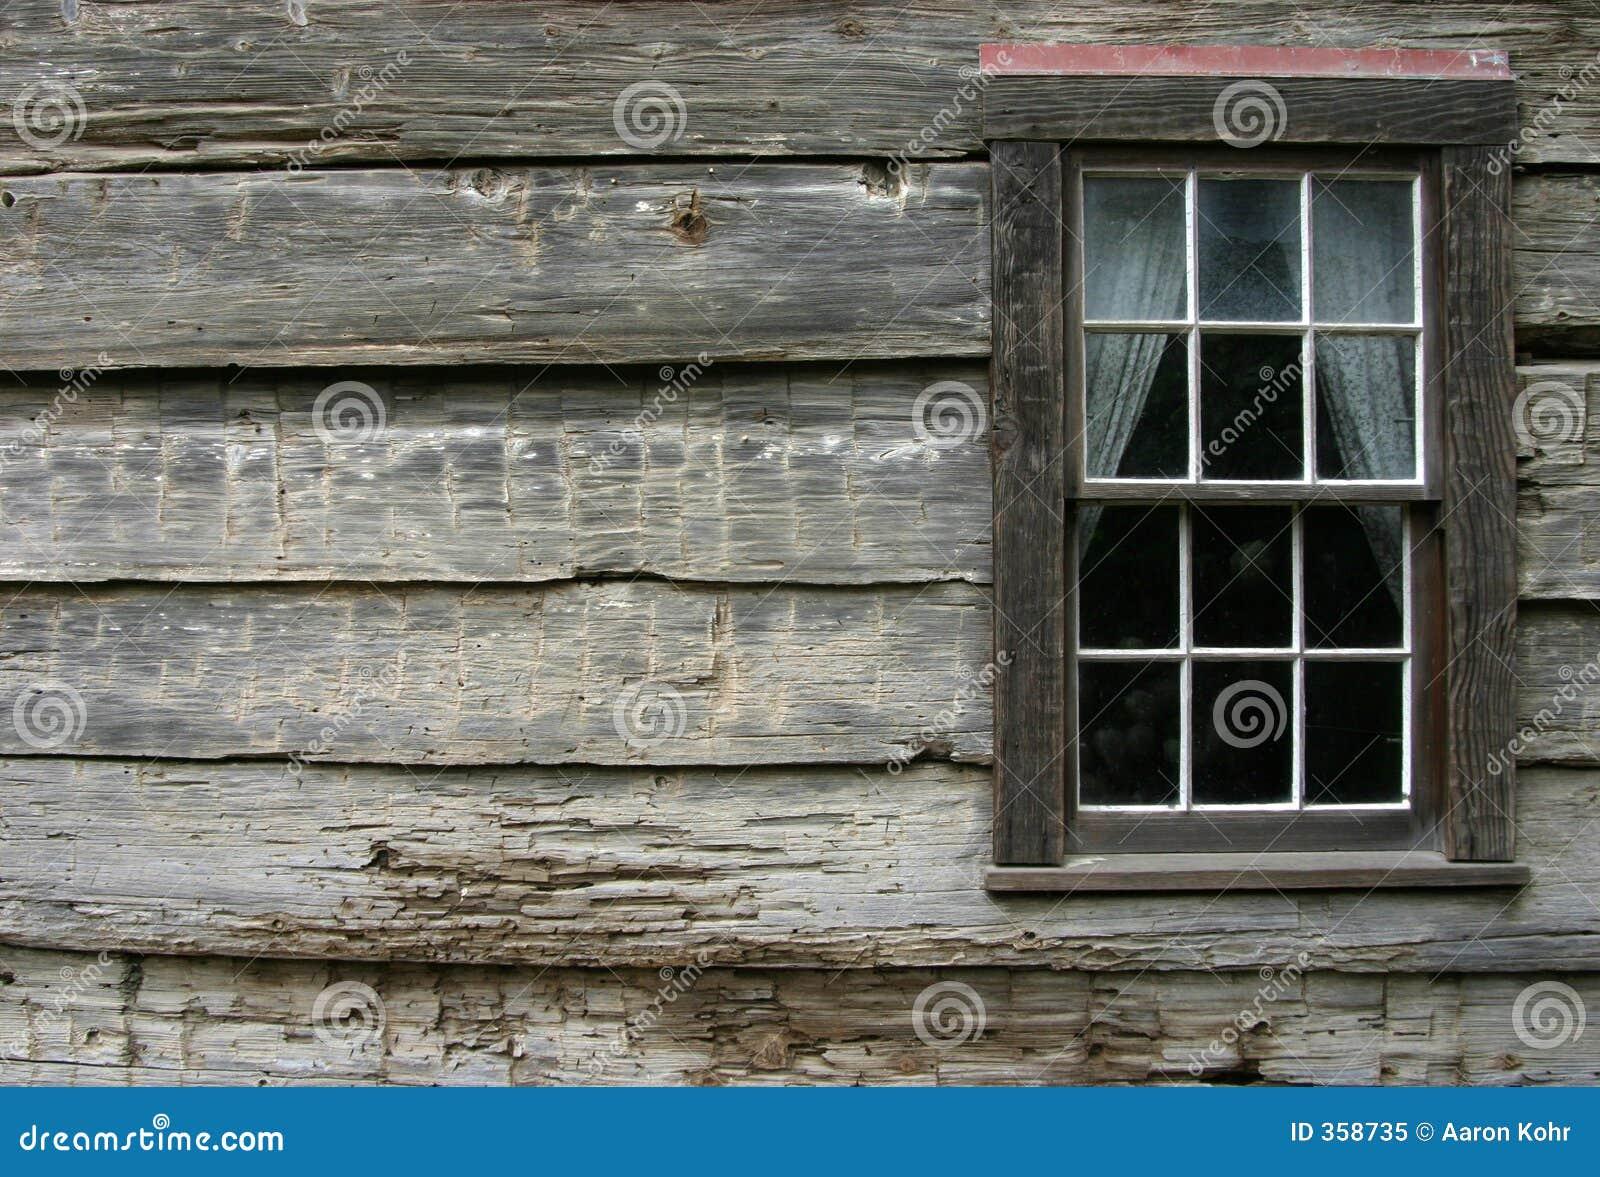 Rustic window 2 royalty free stock photo image 358735 for 2 window